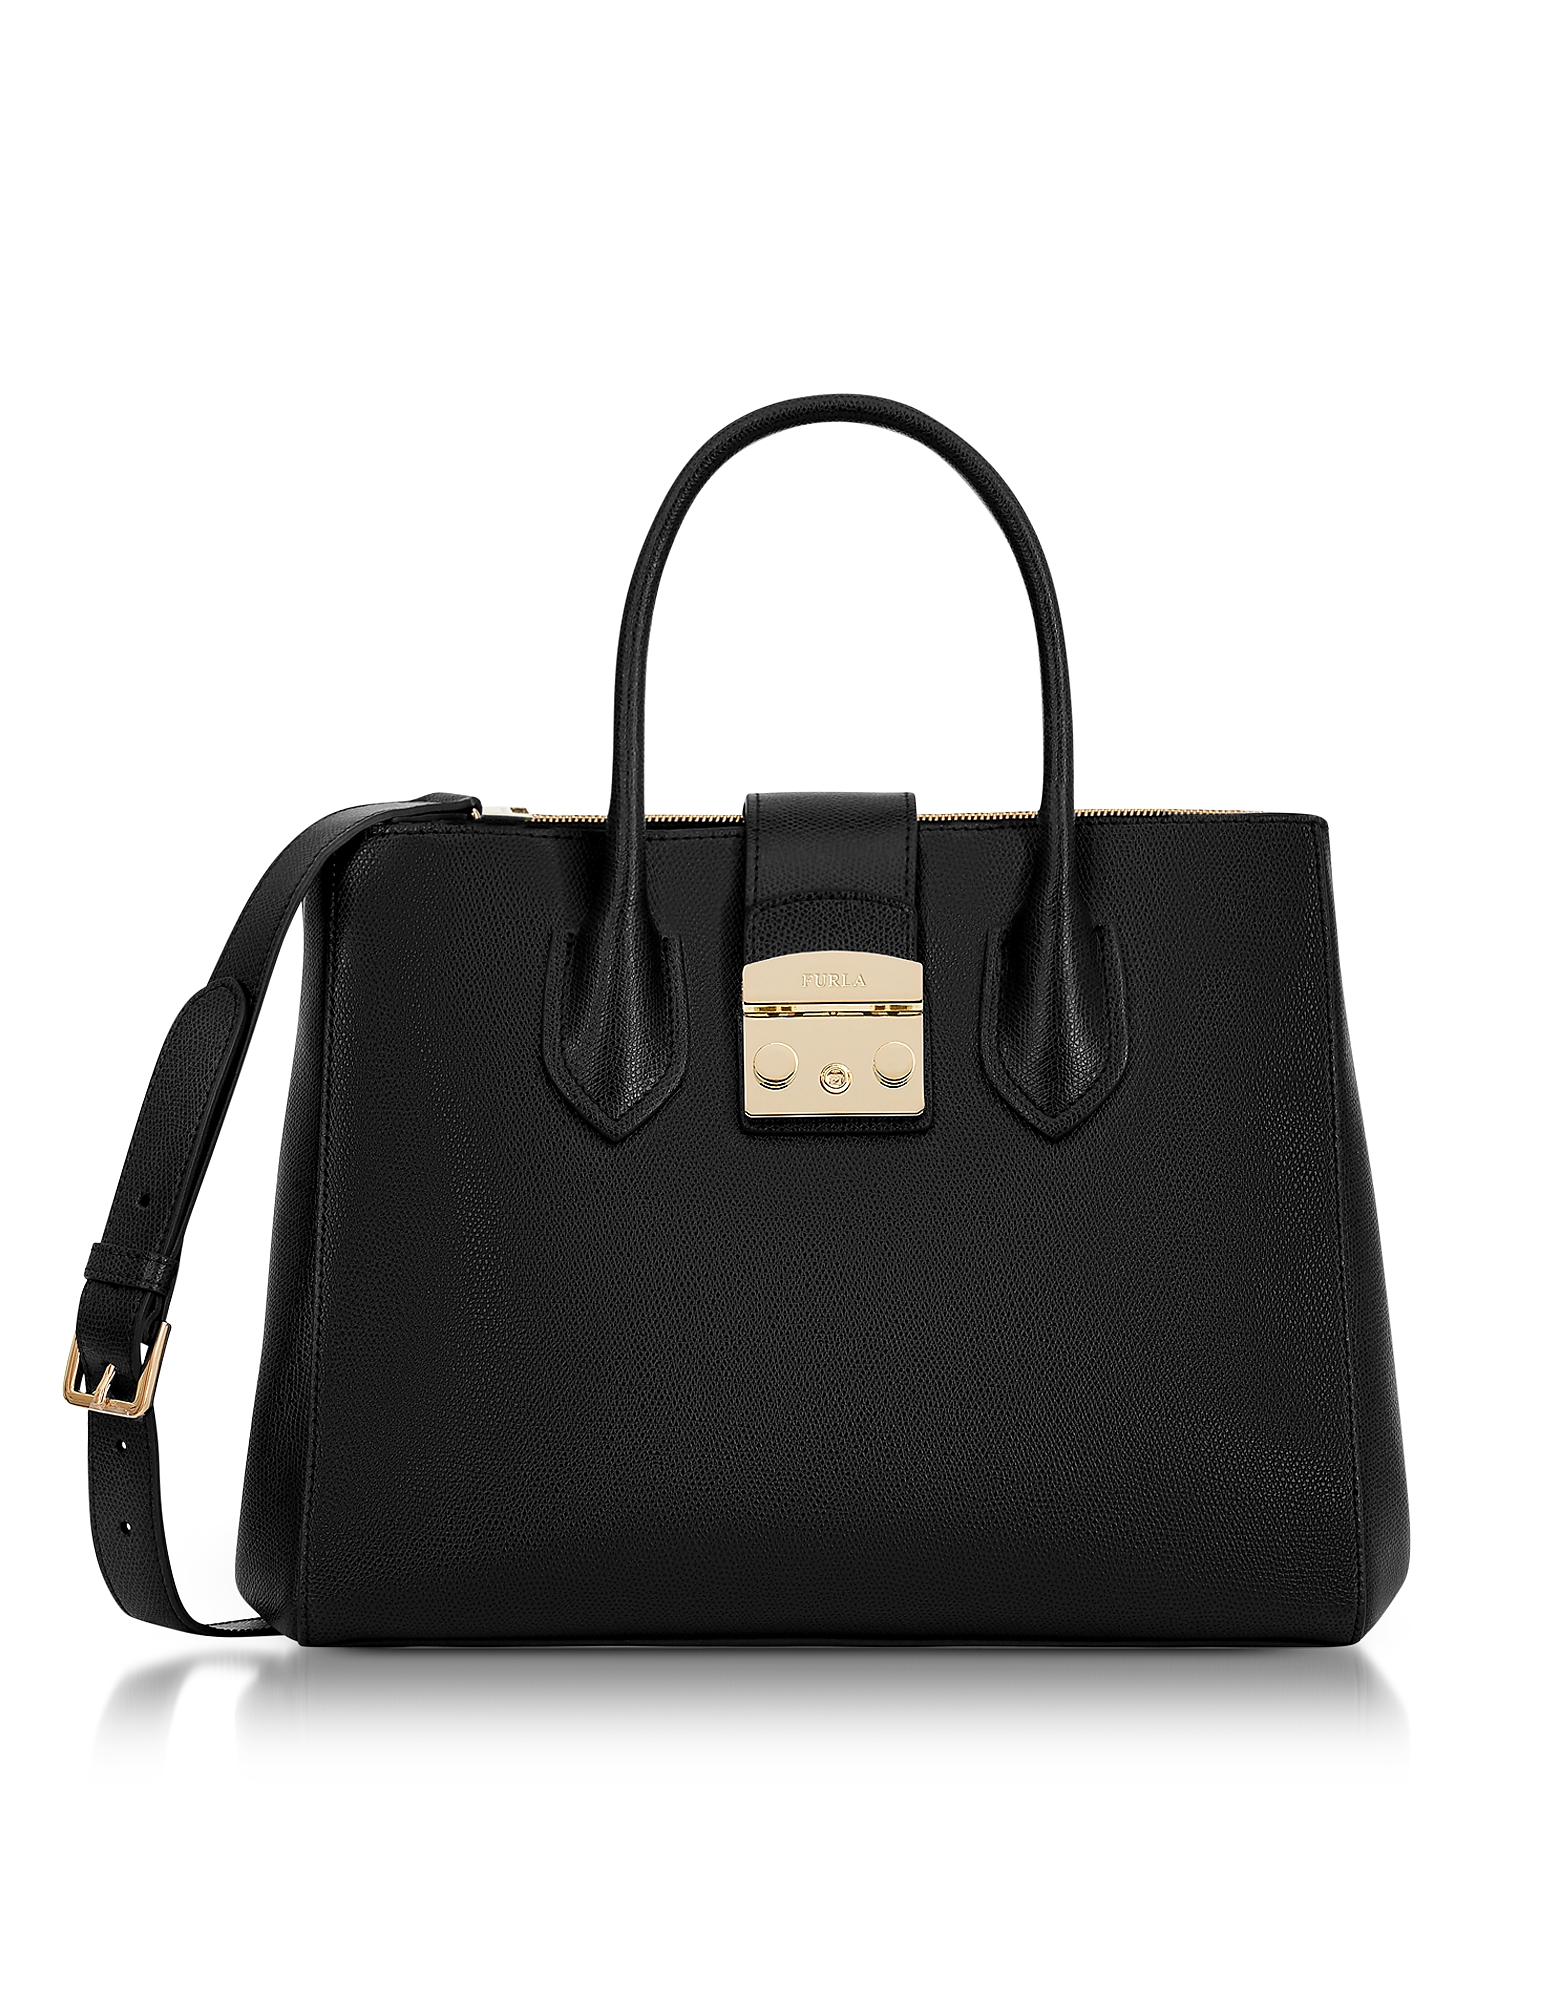 Furla Handbags, Onyx Metropolis Medium Tote Bag